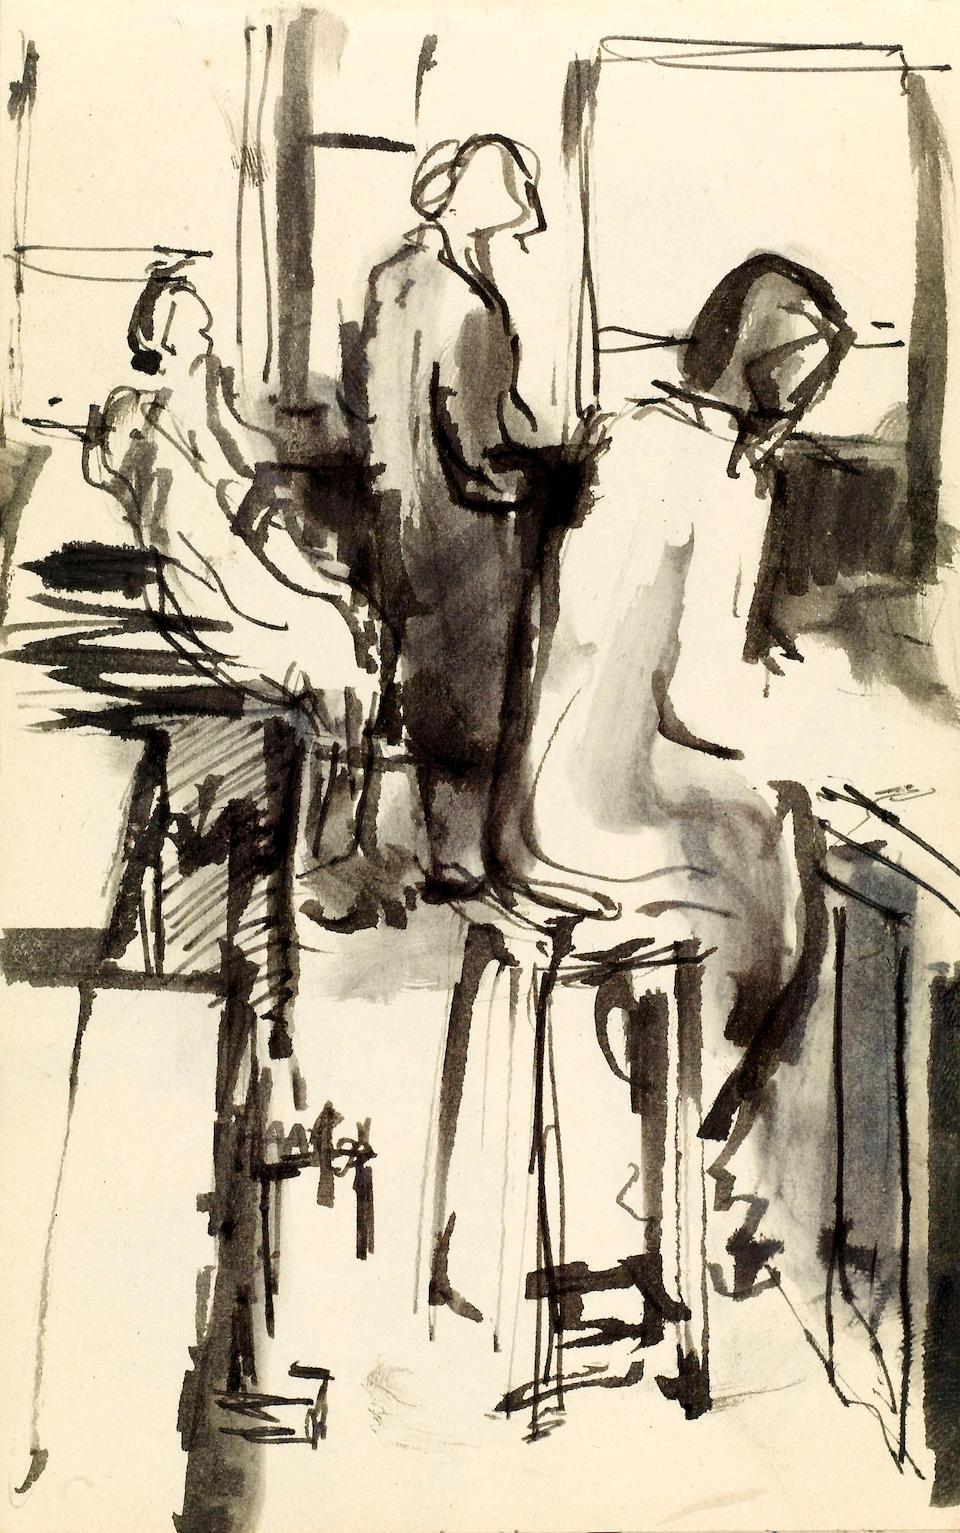 Stuart Sutcliffe's small sketch book  Liverpool College of Art, 1956-59  18 x 11 cm.